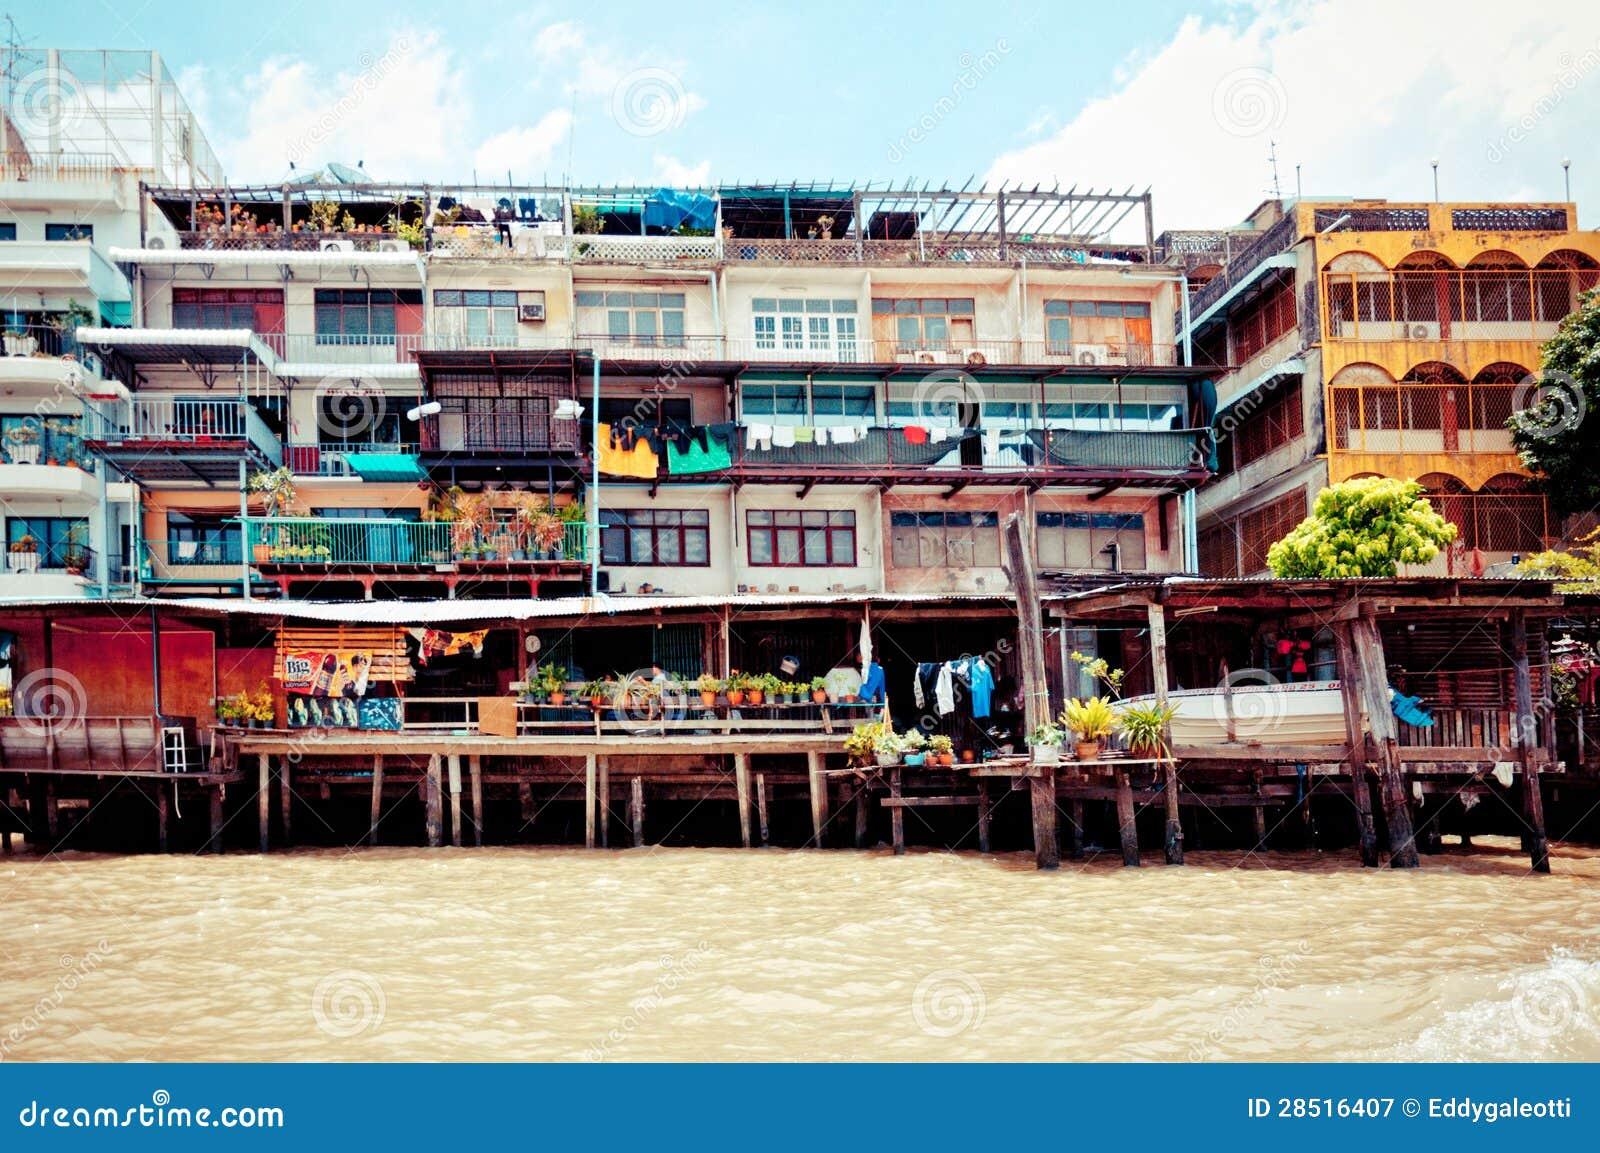 Chao Phraya River And Houses In Bangkok Editorial Photography - Image: 28516407